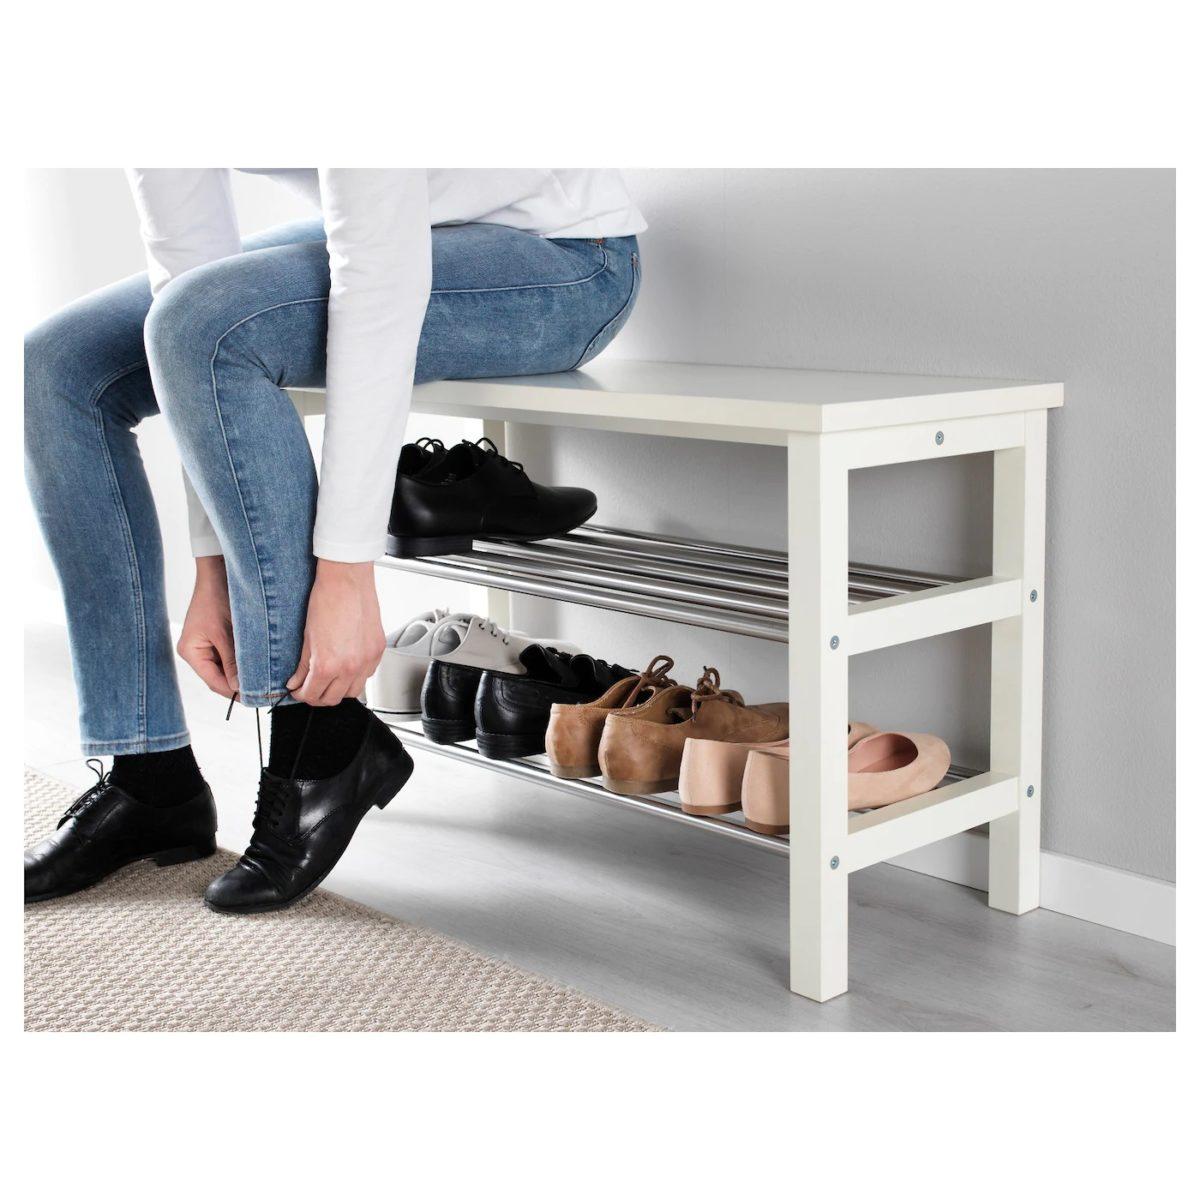 tjusig-panca-vano-scarpe-ikea